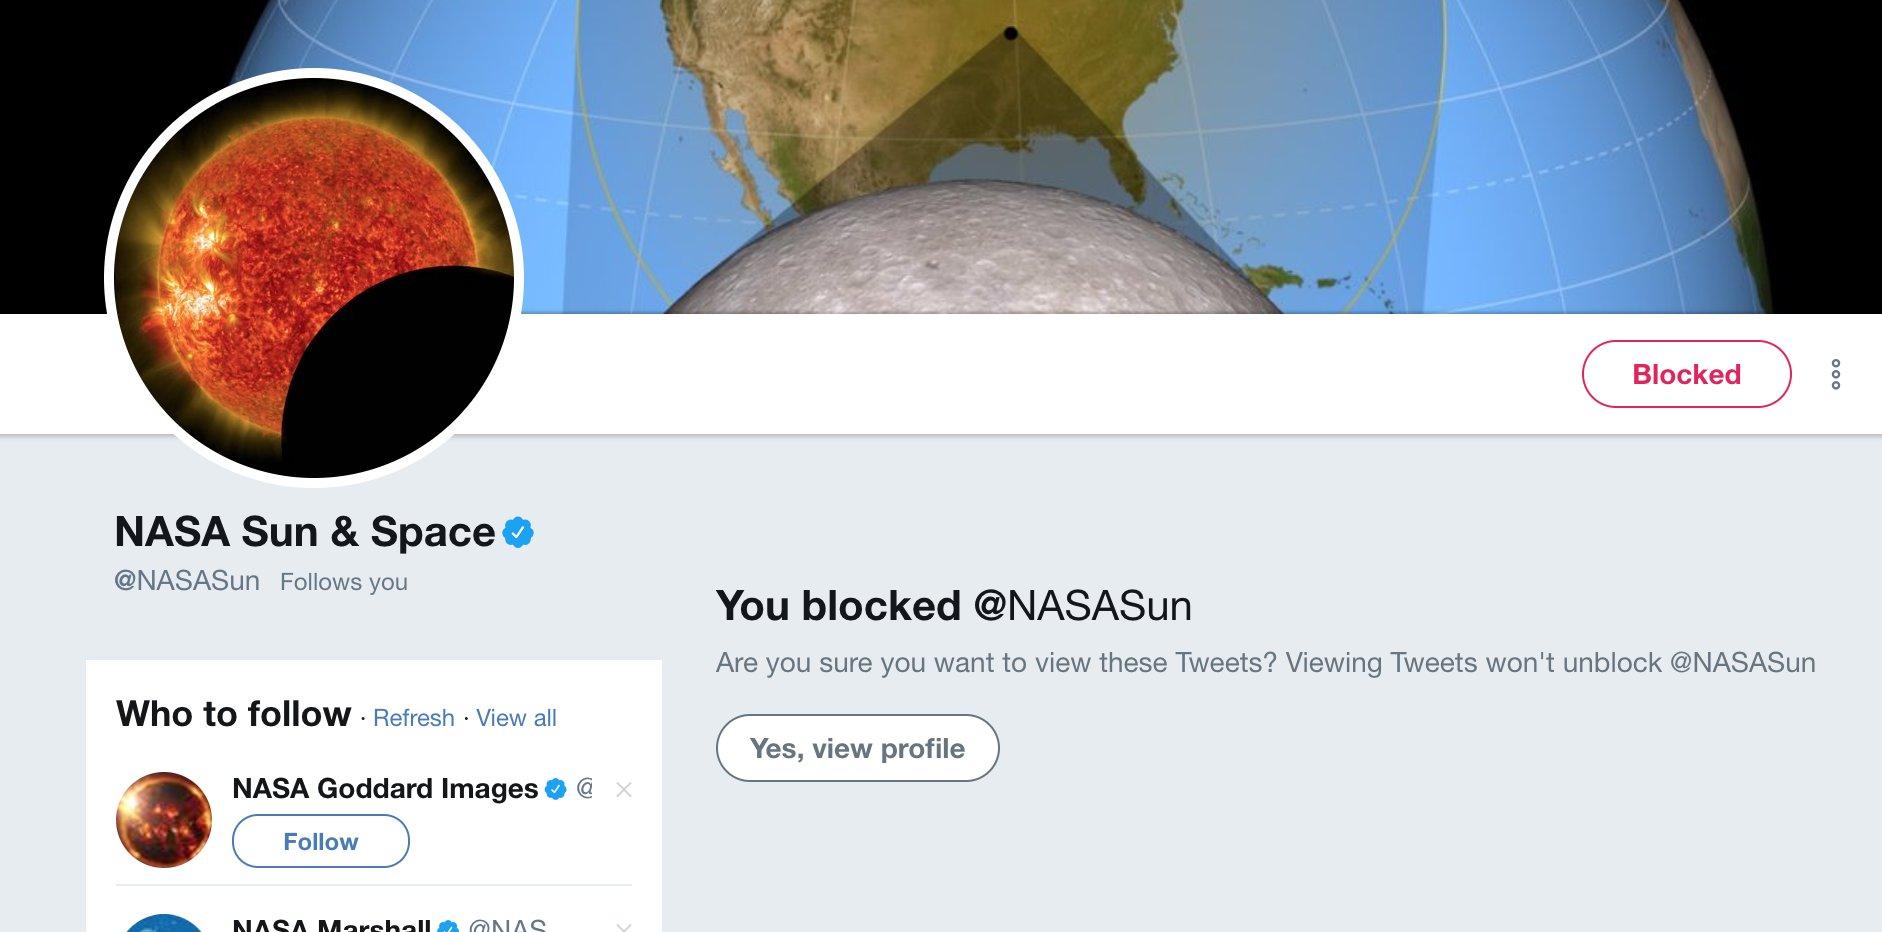 HA HA HA I've blocked the Sun! Make way for the Moon. #SolarEclipse2017 https://t.co/nZCoqBlSTe